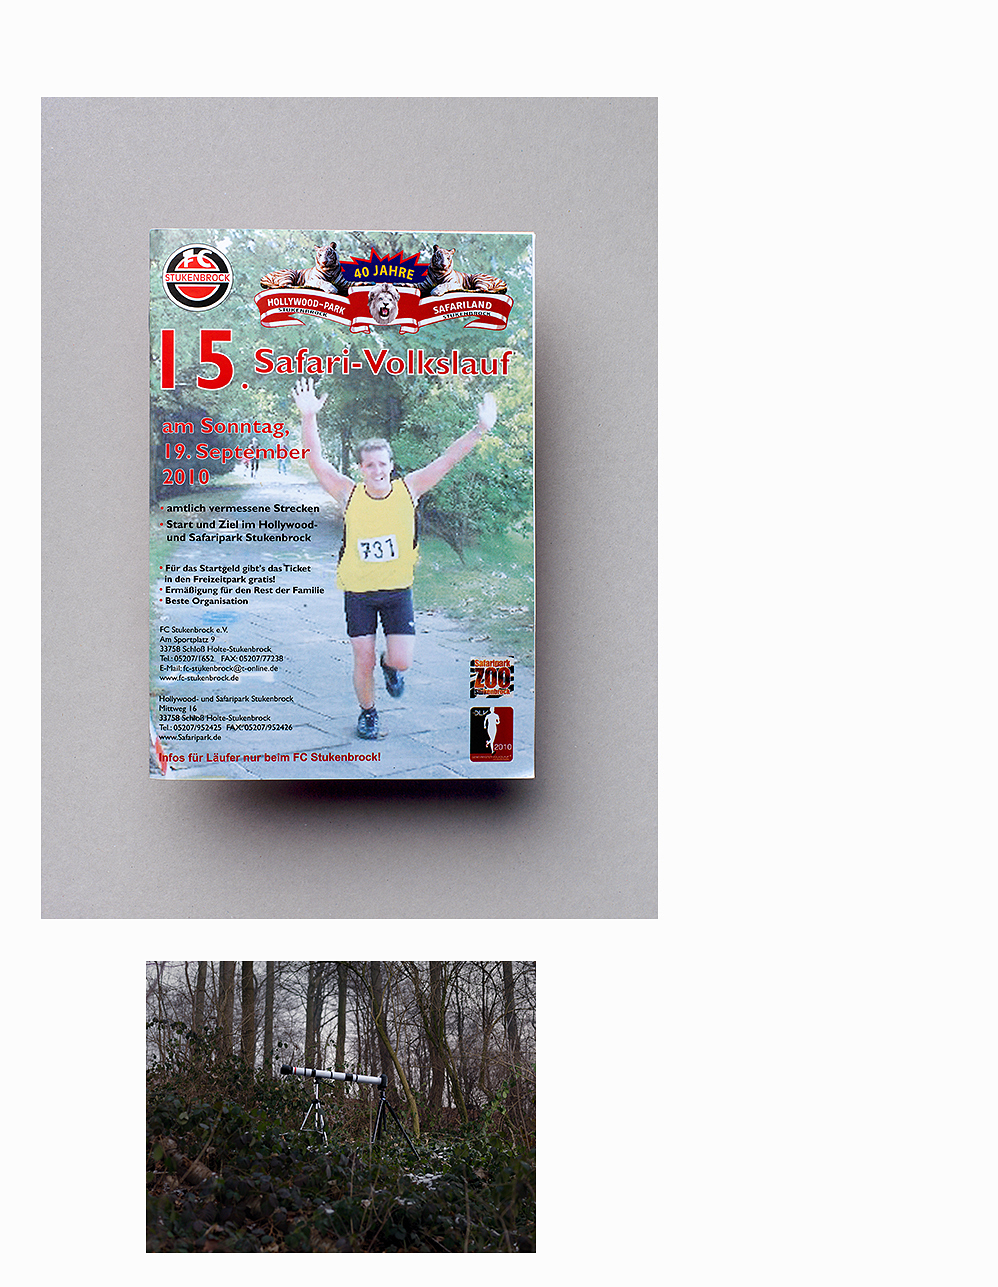 Sportfotografie: Broschüre